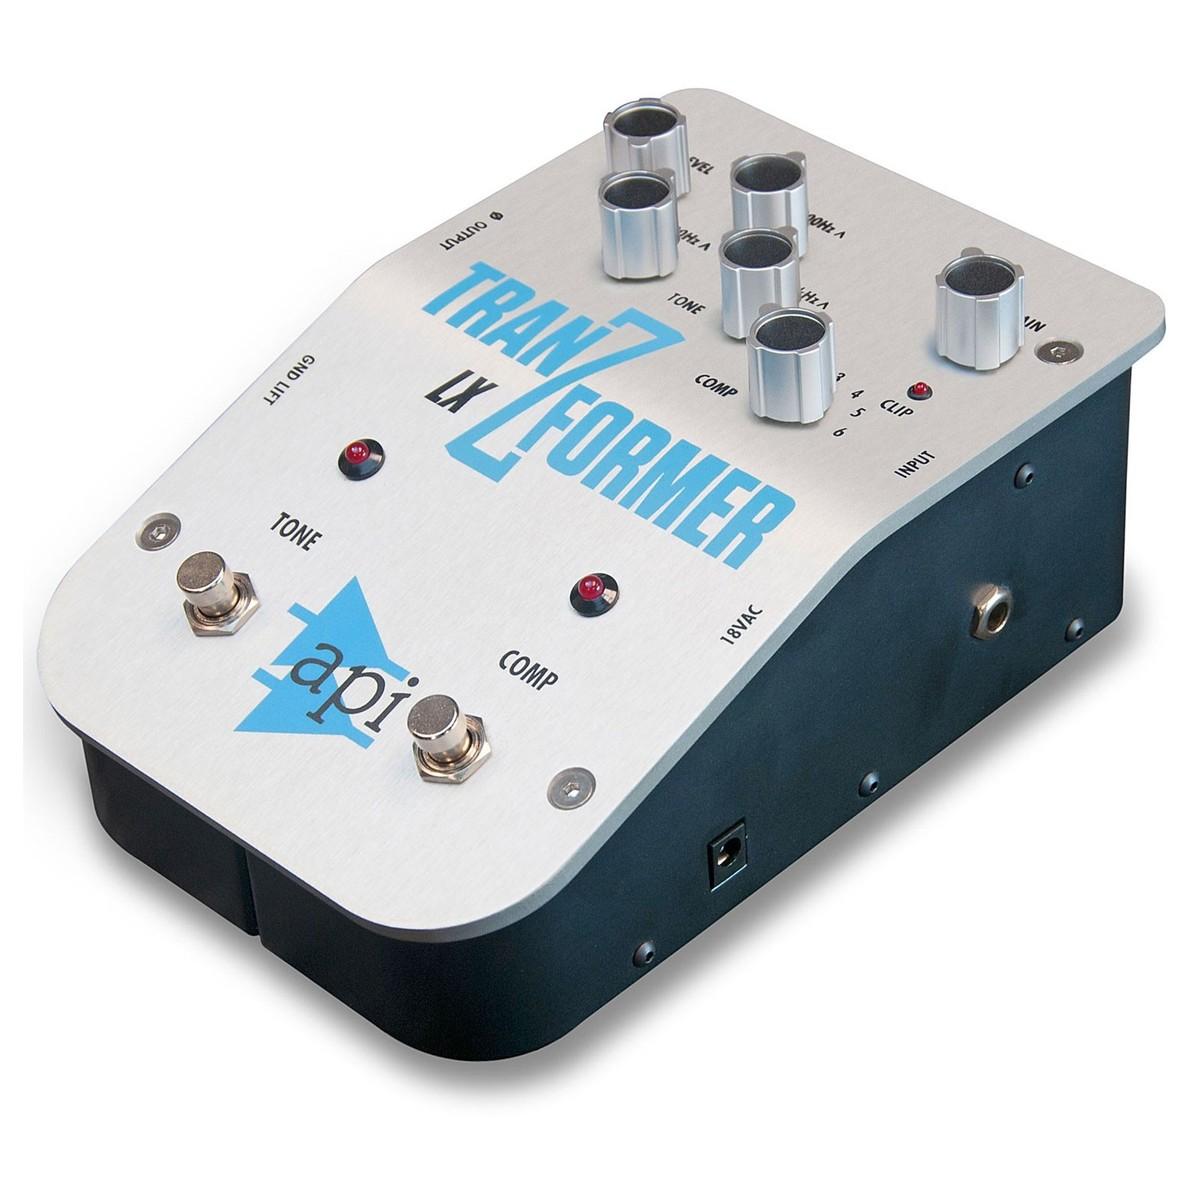 api tranzformer lx bass pedal at gear4music. Black Bedroom Furniture Sets. Home Design Ideas